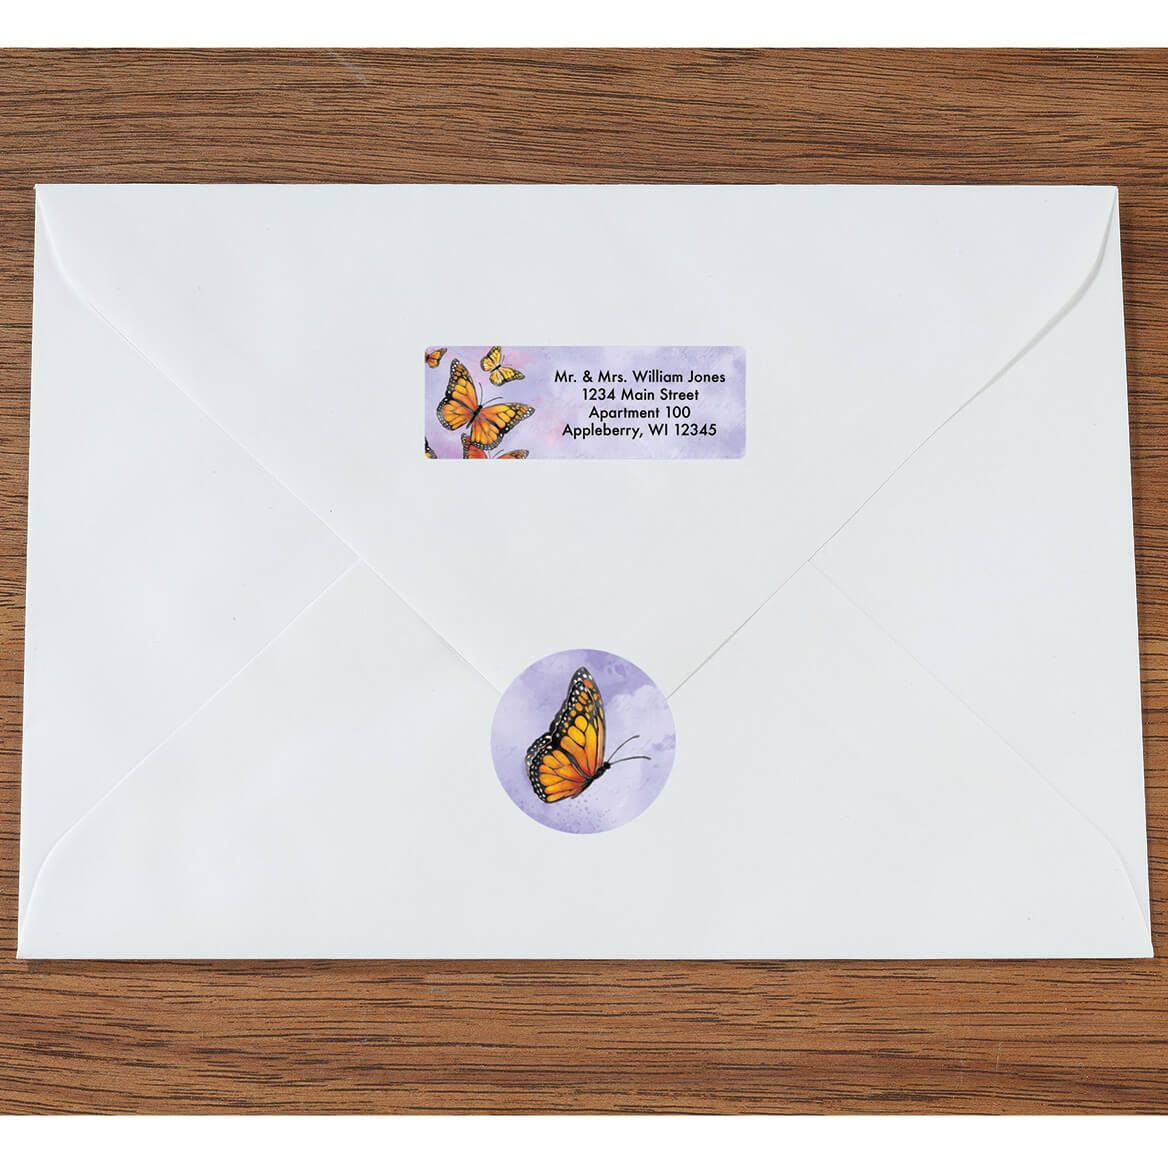 Personalized Butterflies Labels & Envelope Seals 60-365590